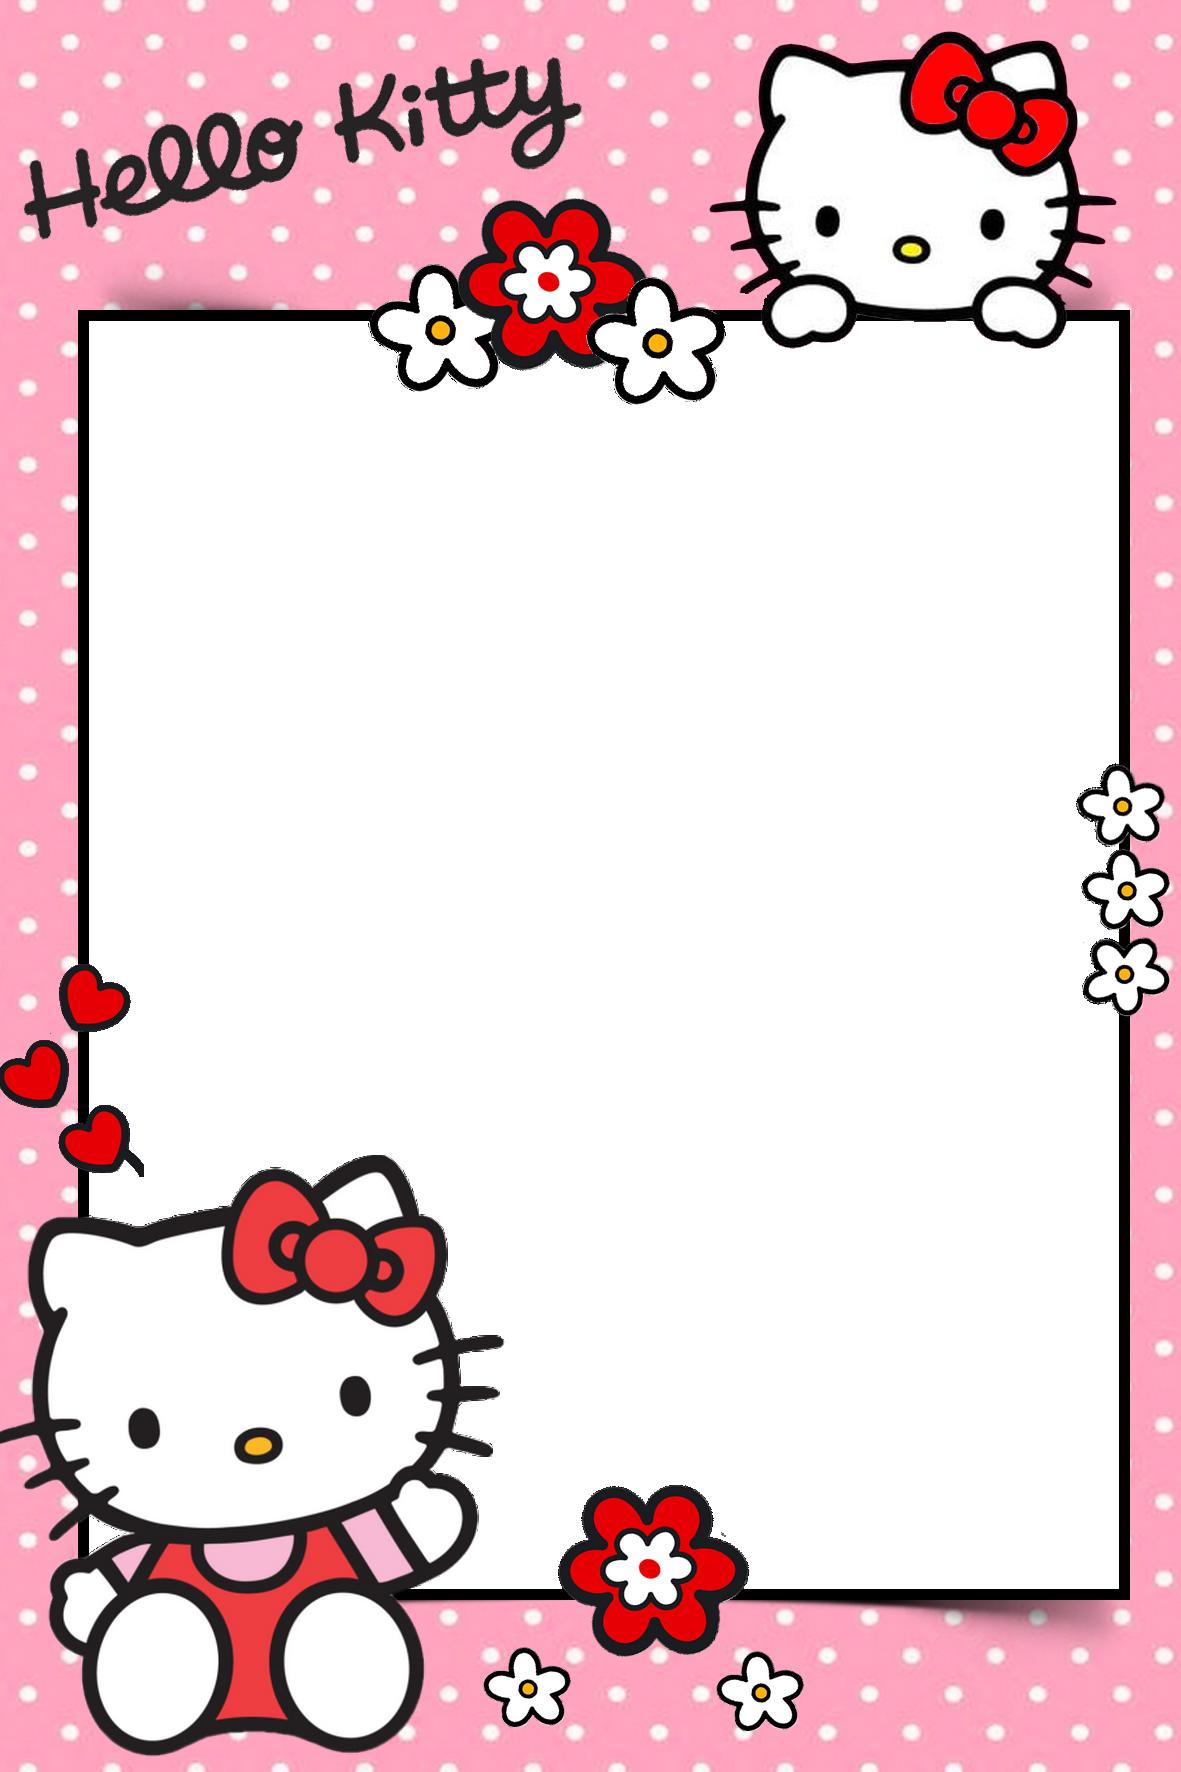 Frame For Children Png Hello Kitty Printables Hello Kitty Invitations Hello Kitty Backgrounds